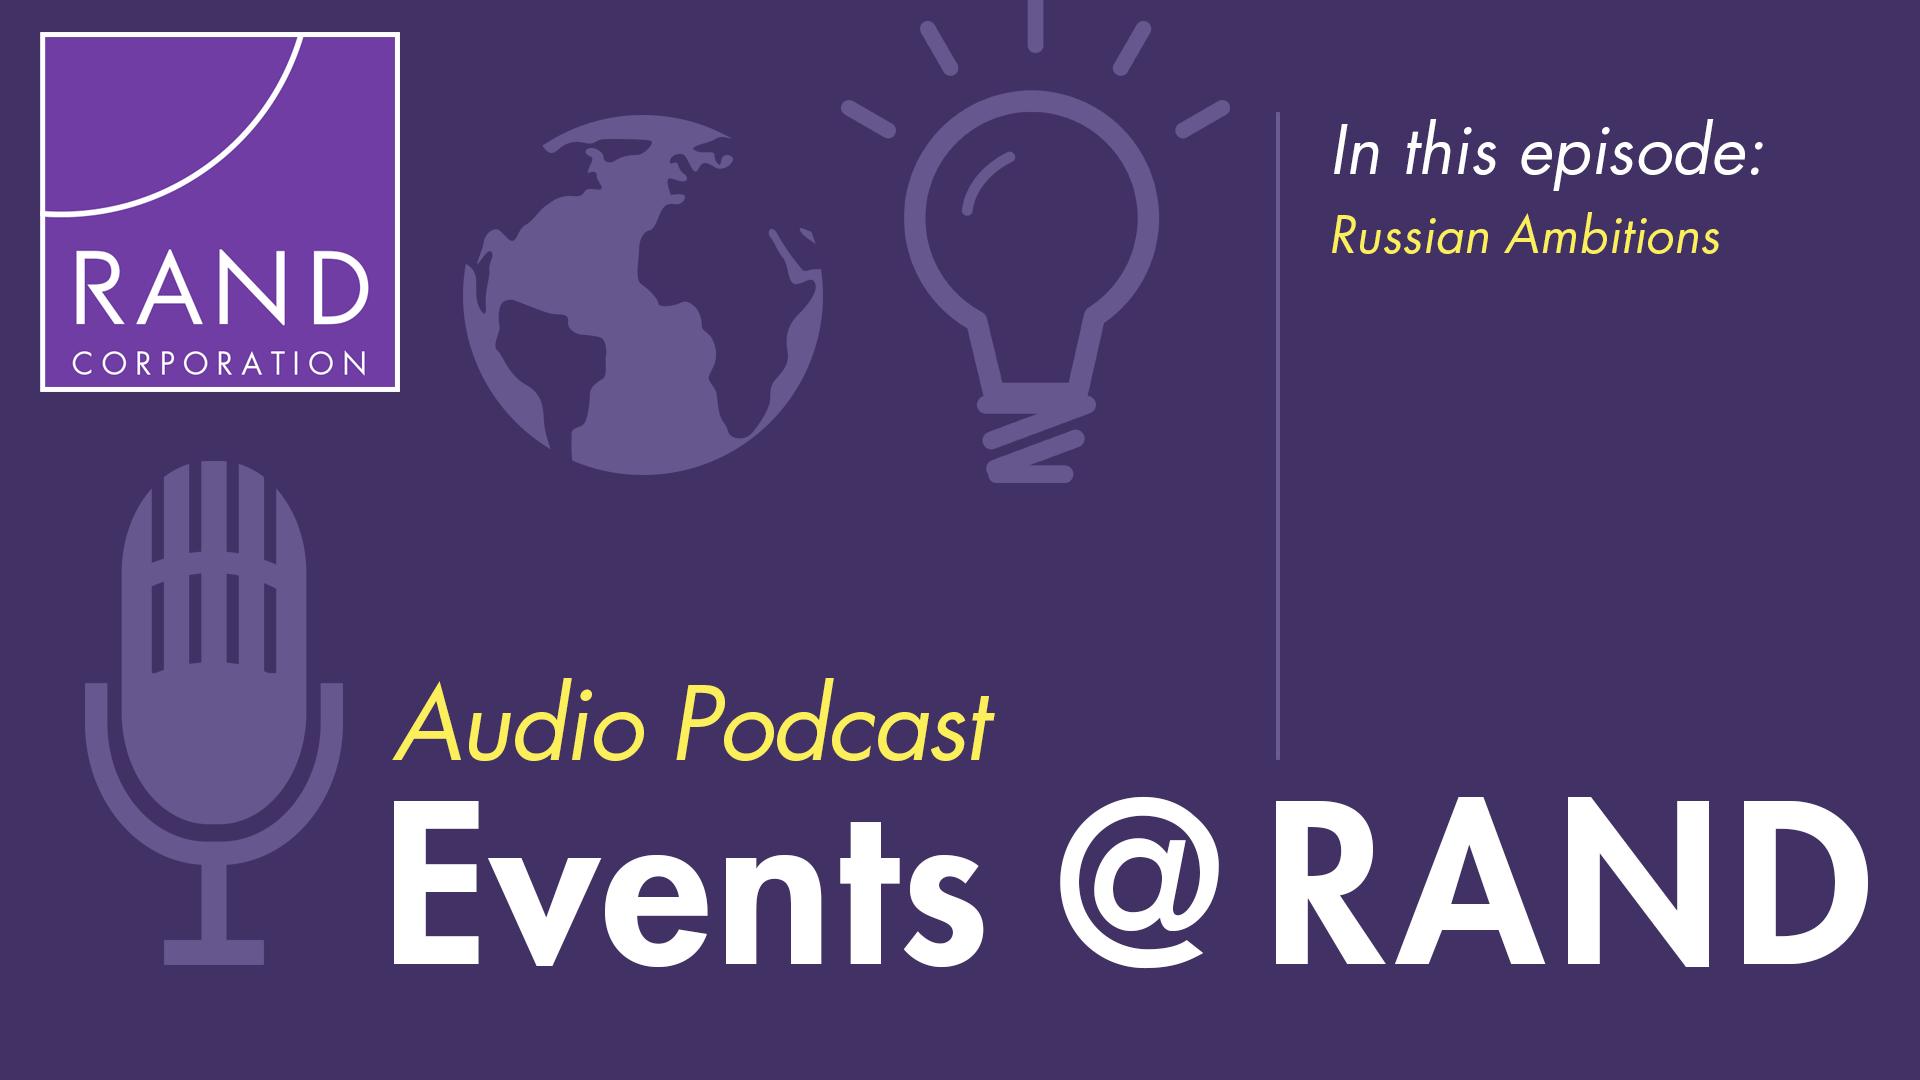 Examining Russian Ambitions